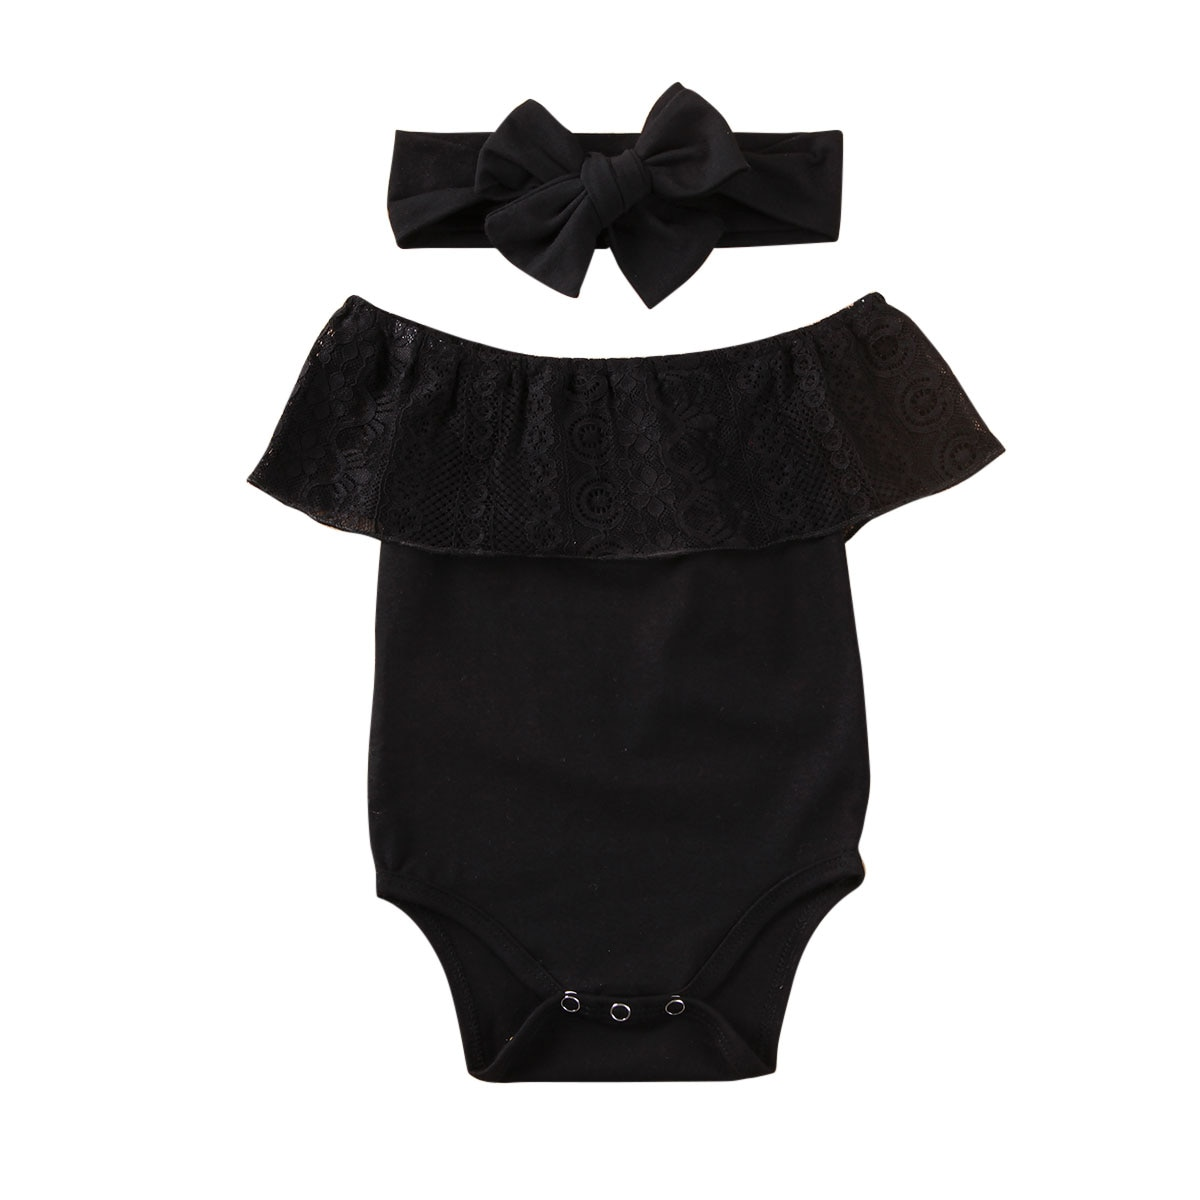 Newest 2PCS Newborn Baby Girl Clothes Romper Bodysuit Headband Outfit Set Indent Girls Sweet Lace Romper Bodysuit Black